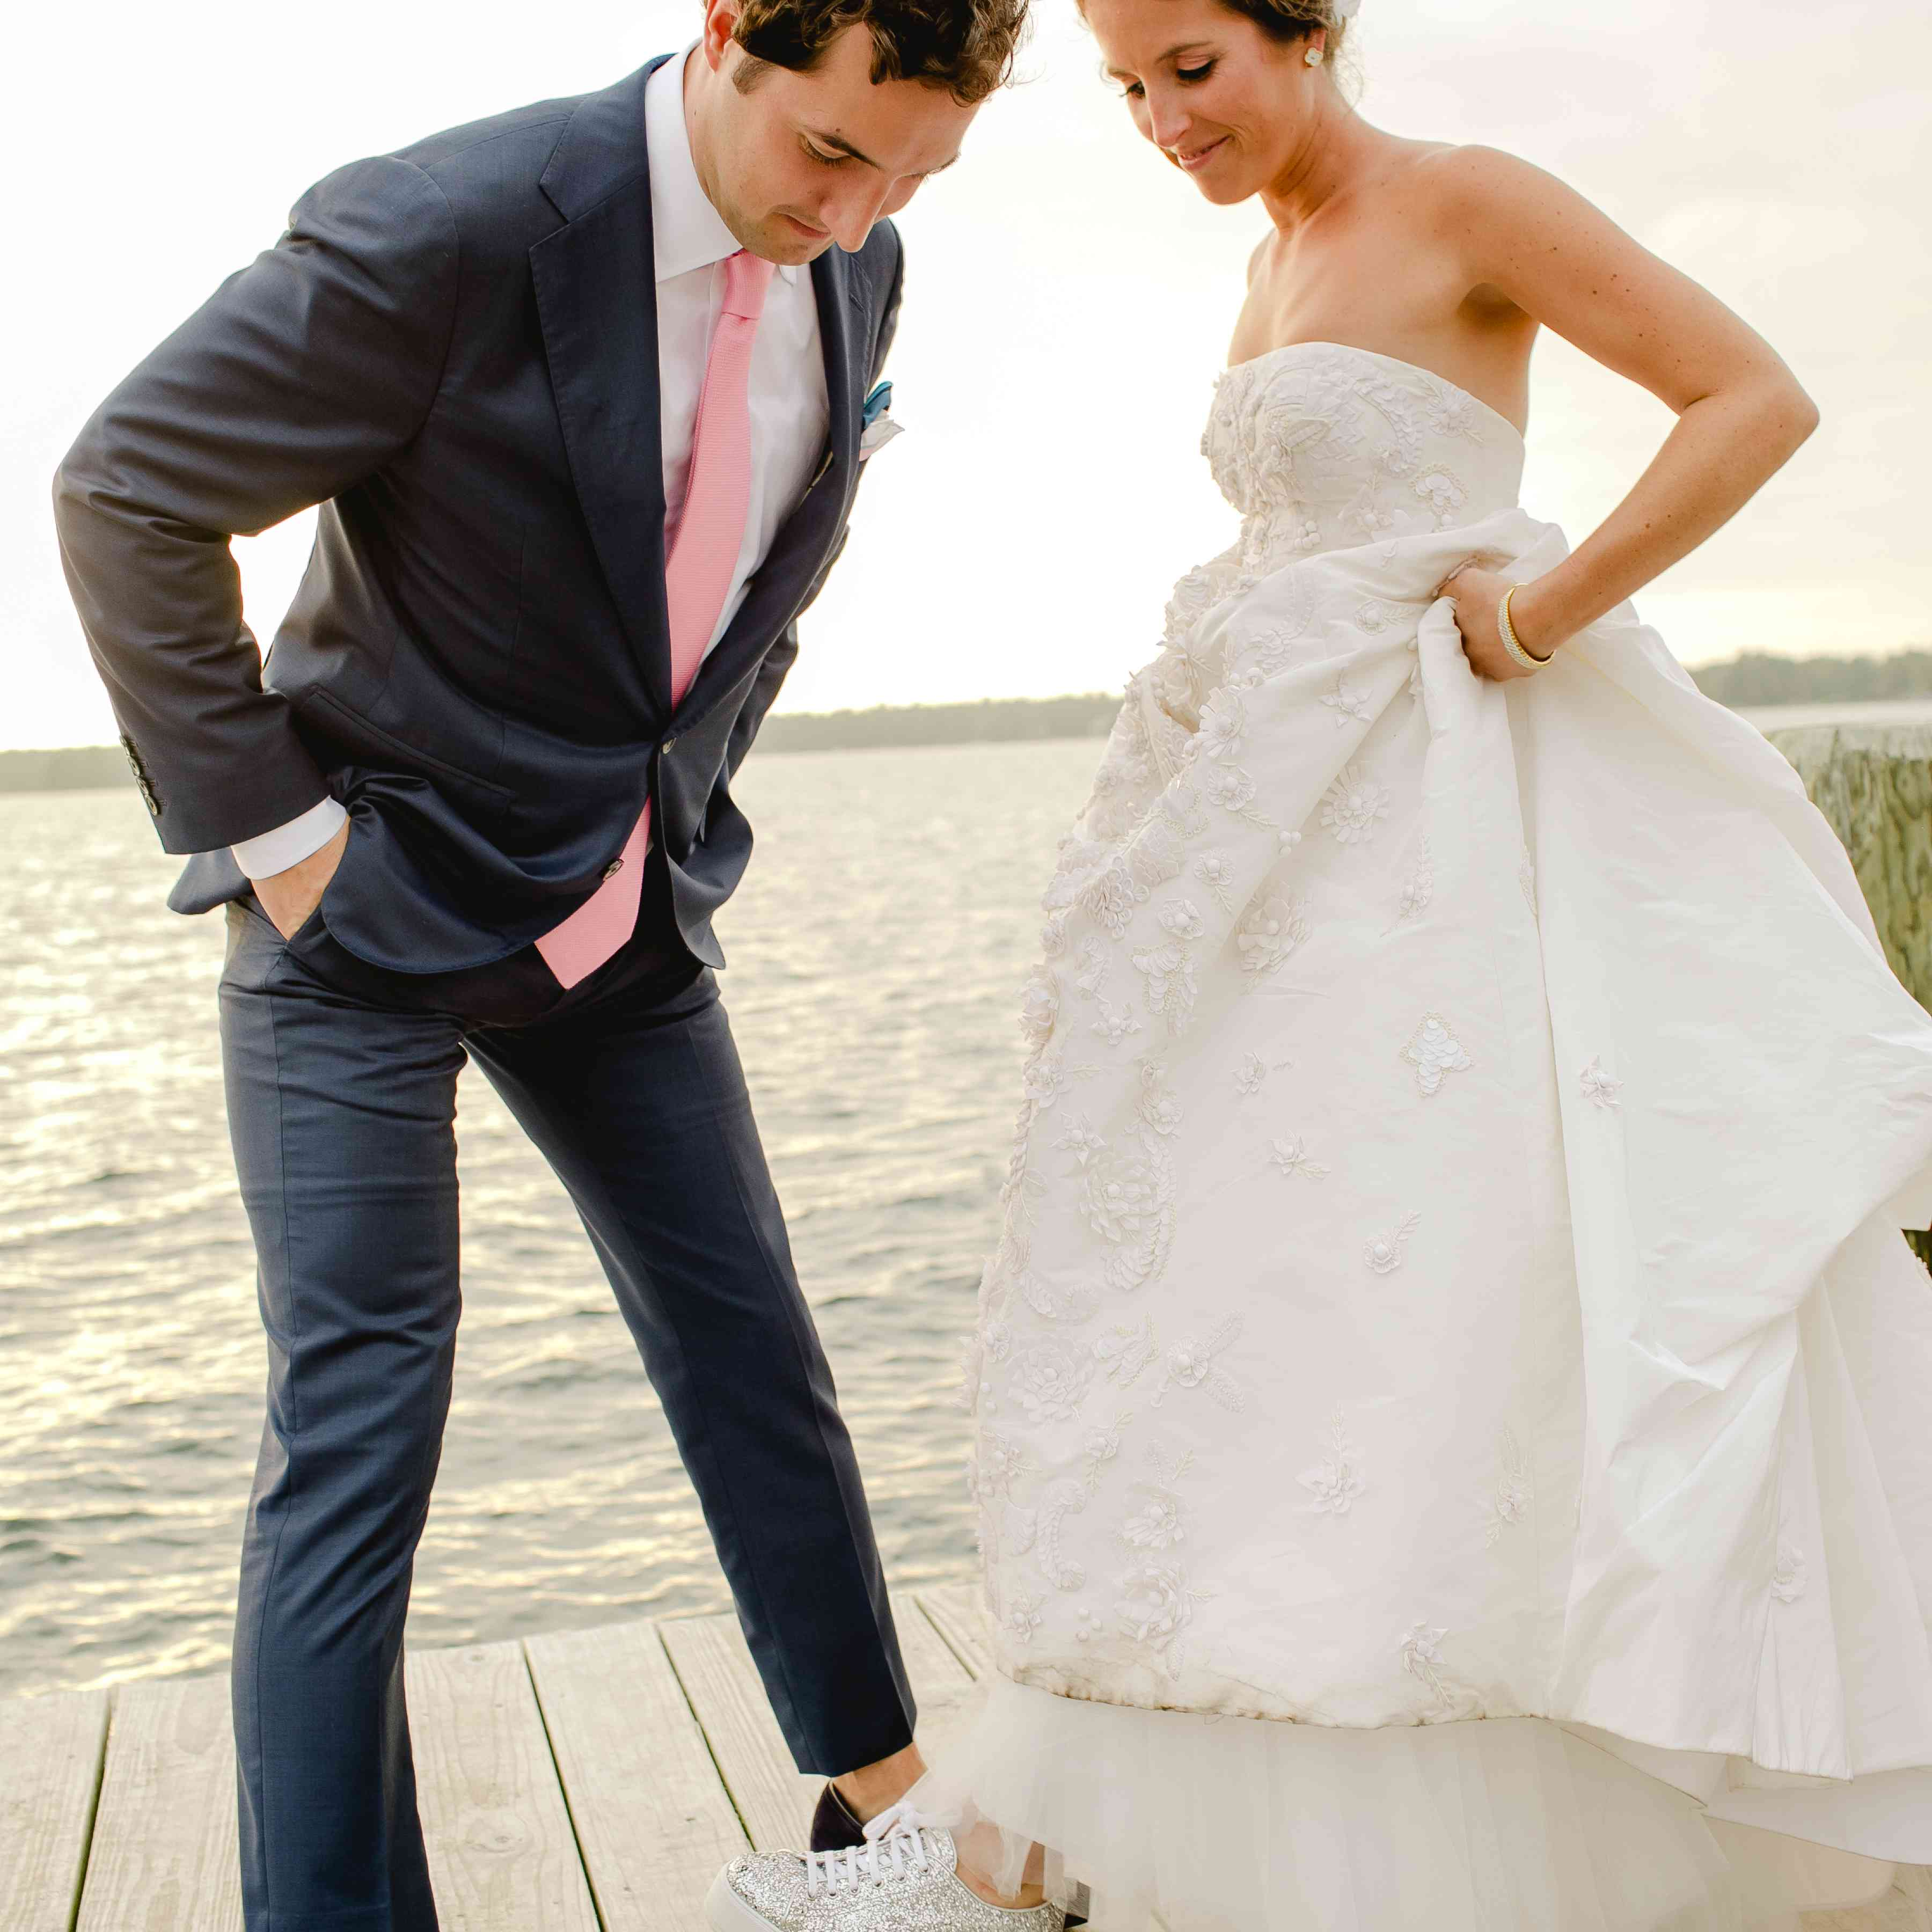 brides sneakers